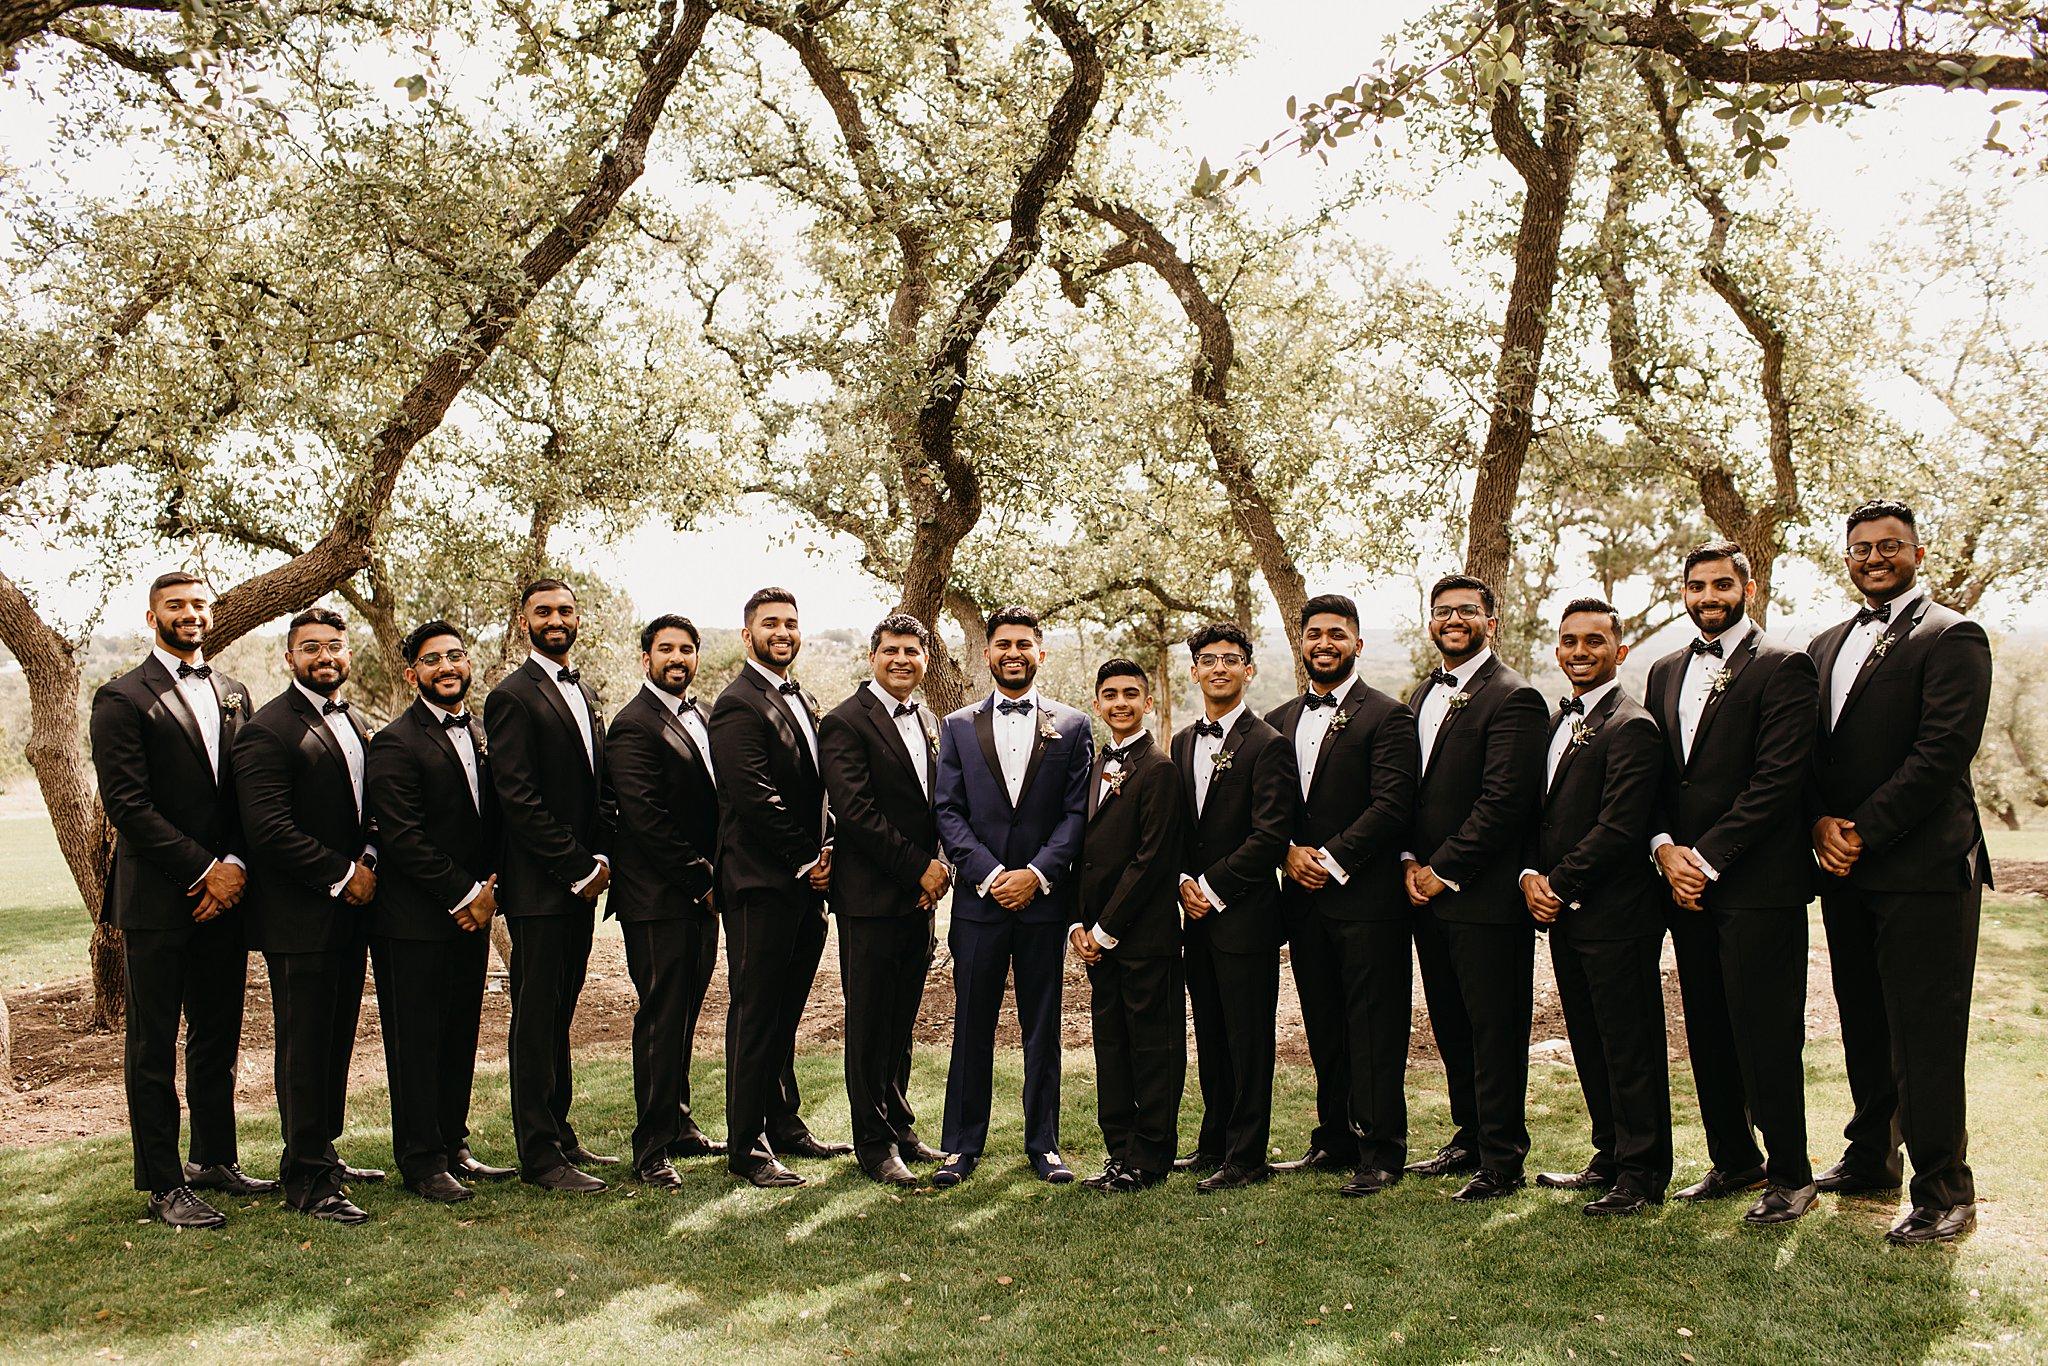 Wilderlove Co_Dripping Springs Texas_Texas Hill Country Wedding_Photography_0033.jpg